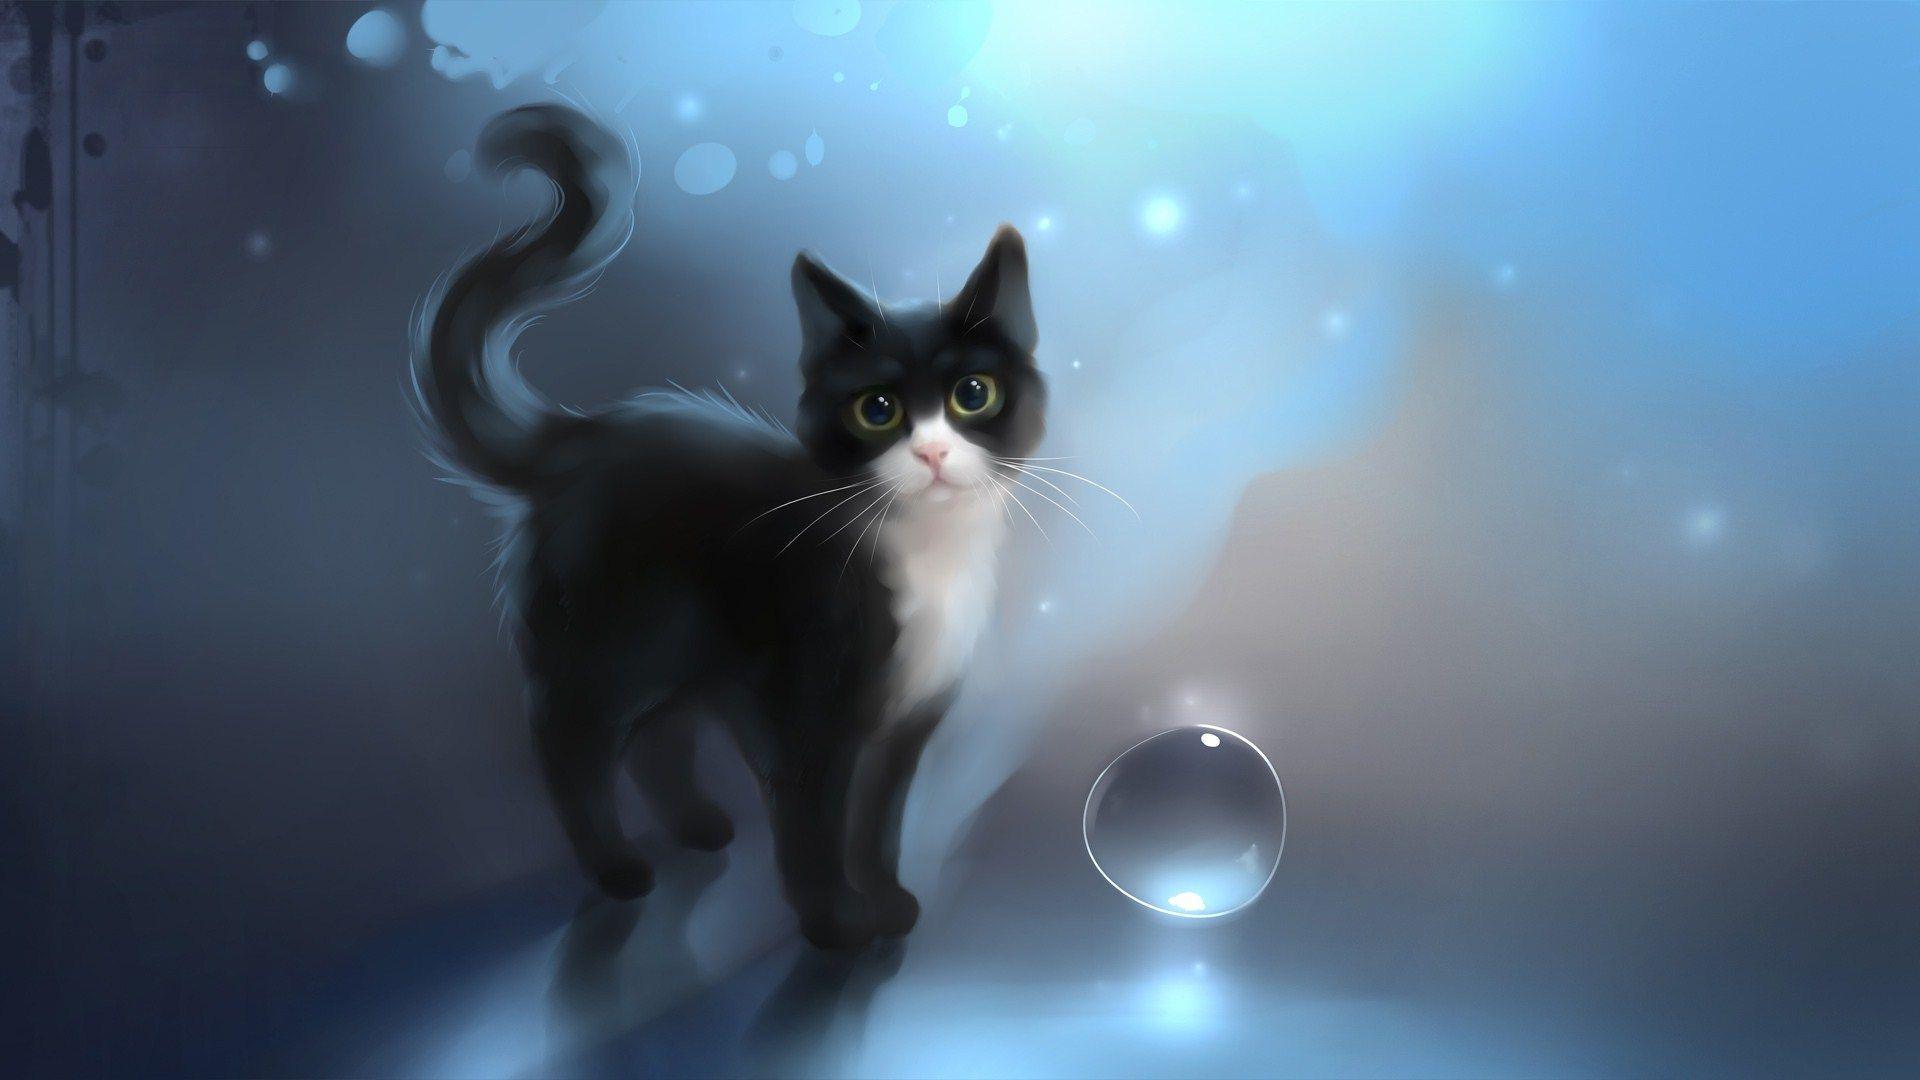 Cat Art Wallpapers Top Free Cat Art Backgrounds Wallpaperaccess